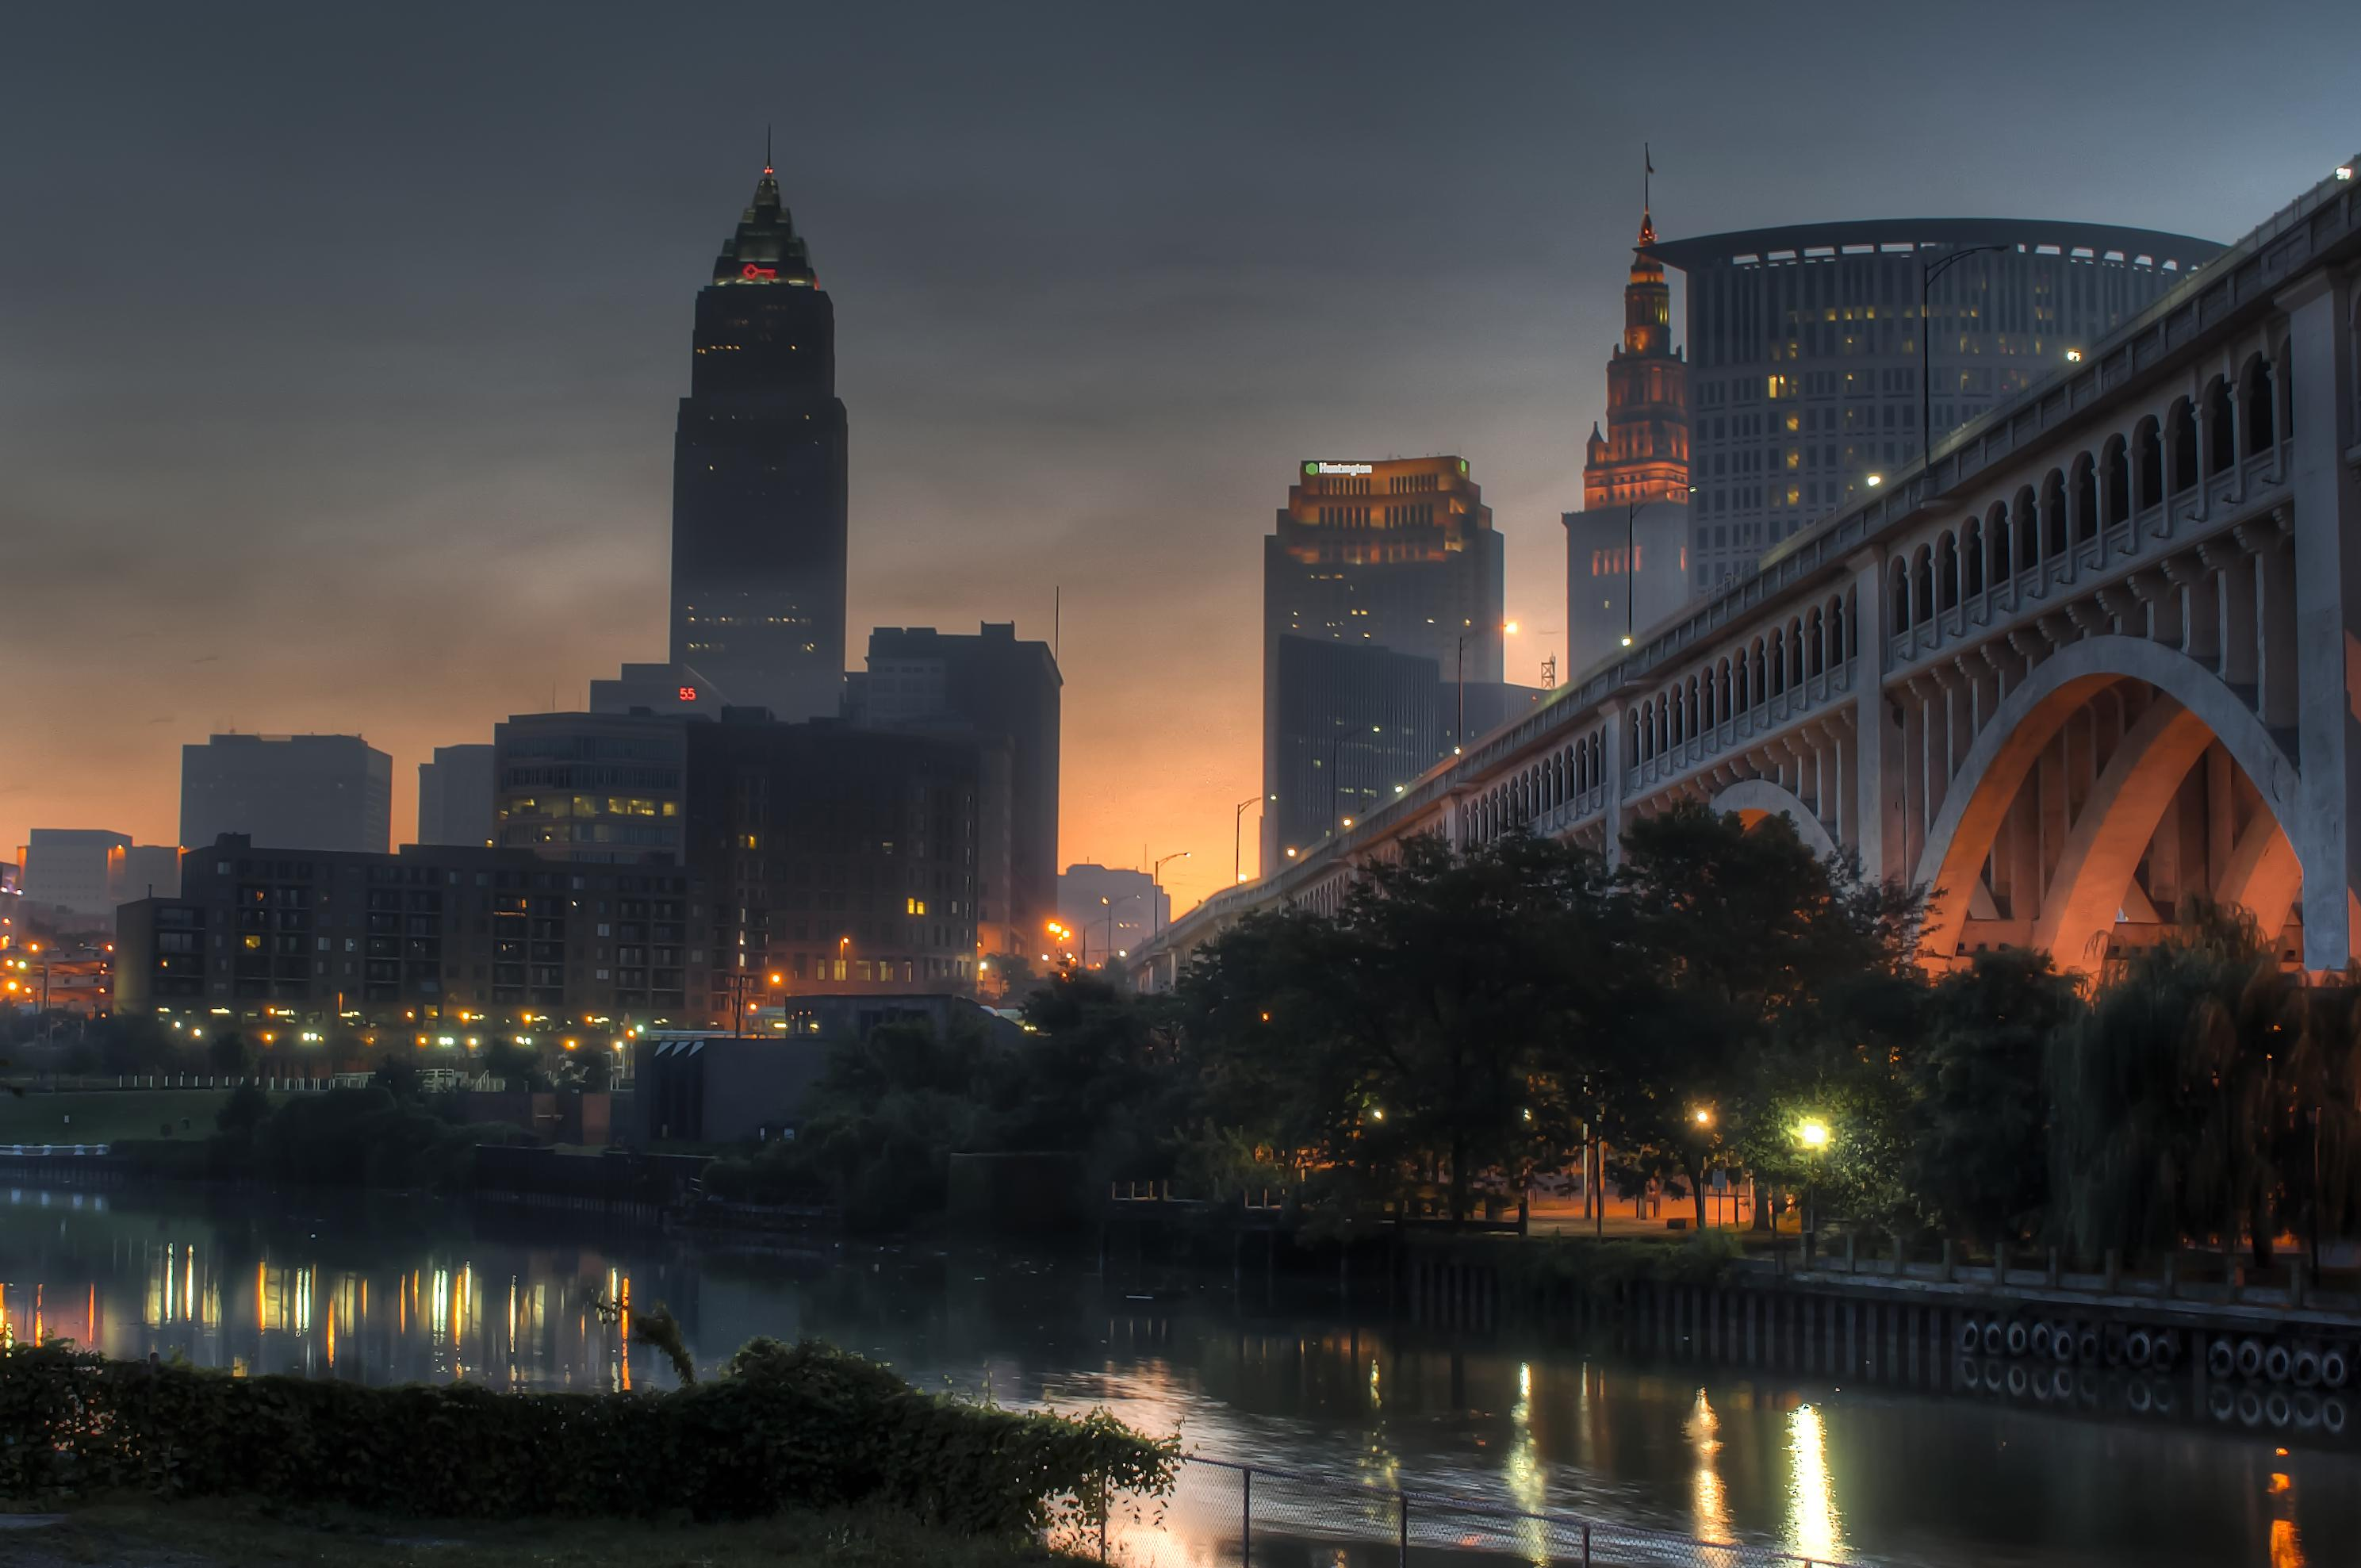 Skyline of Downtown Cleveland, Ohio